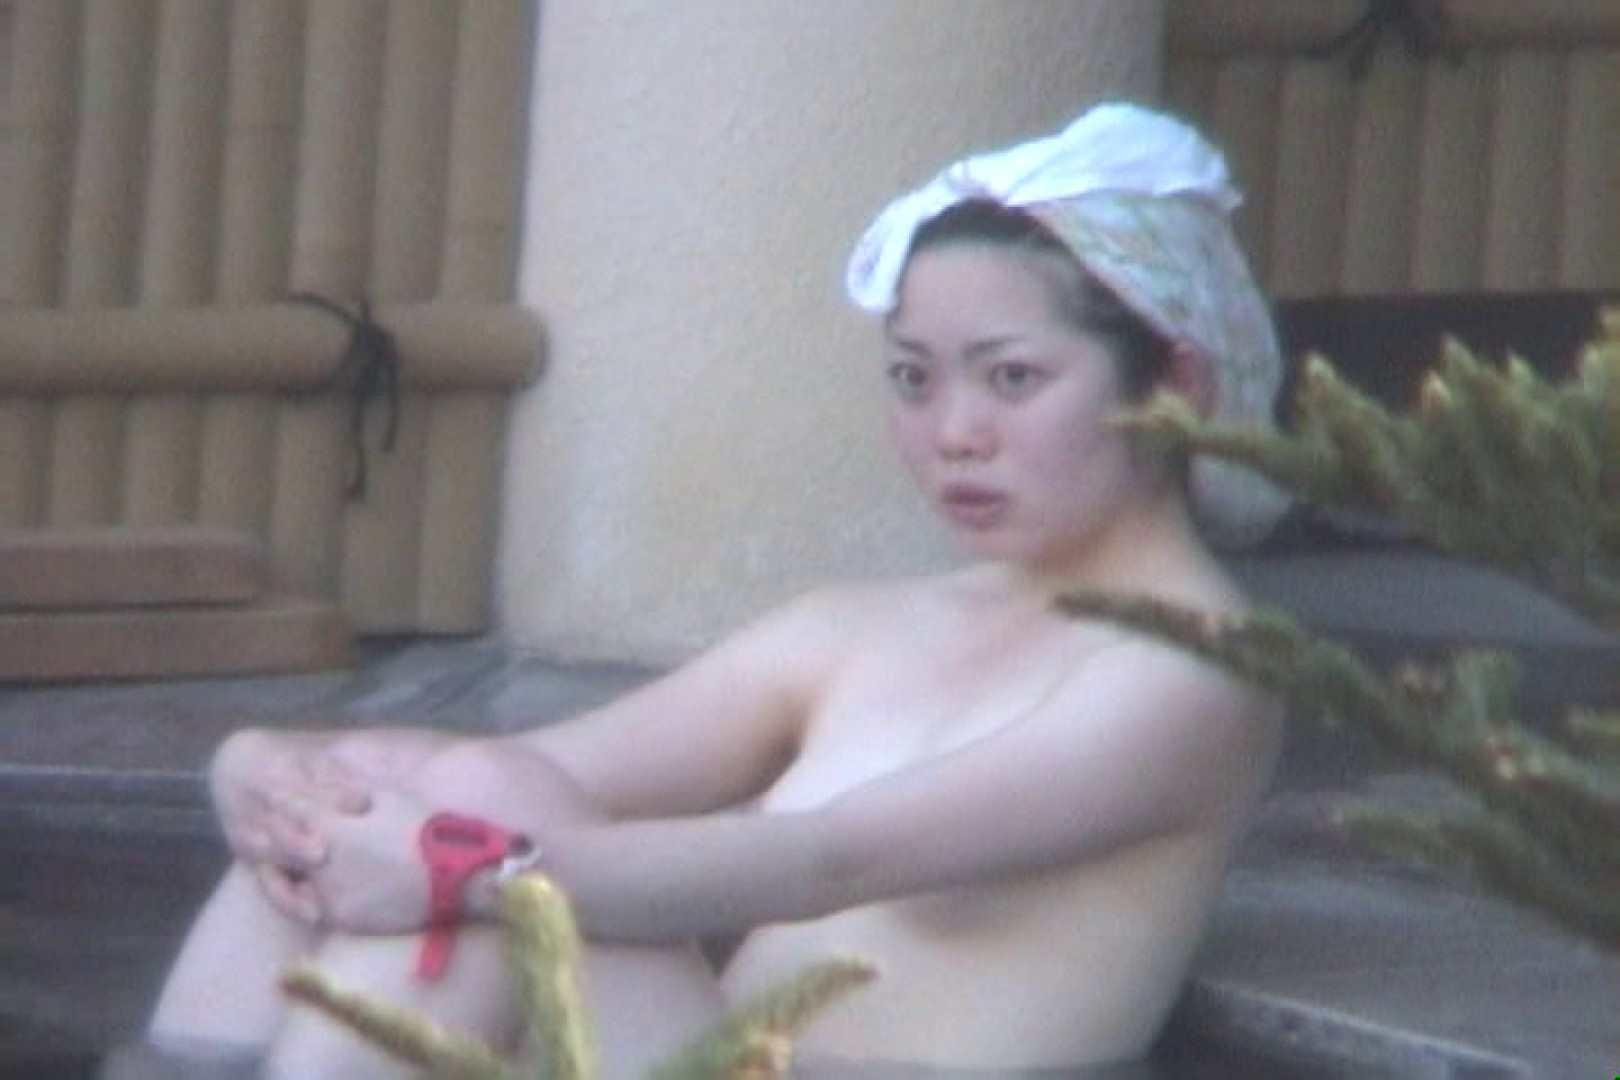 Aquaな露天風呂Vol.86【VIP限定】 露天風呂突入 性交動画流出 94pic 83